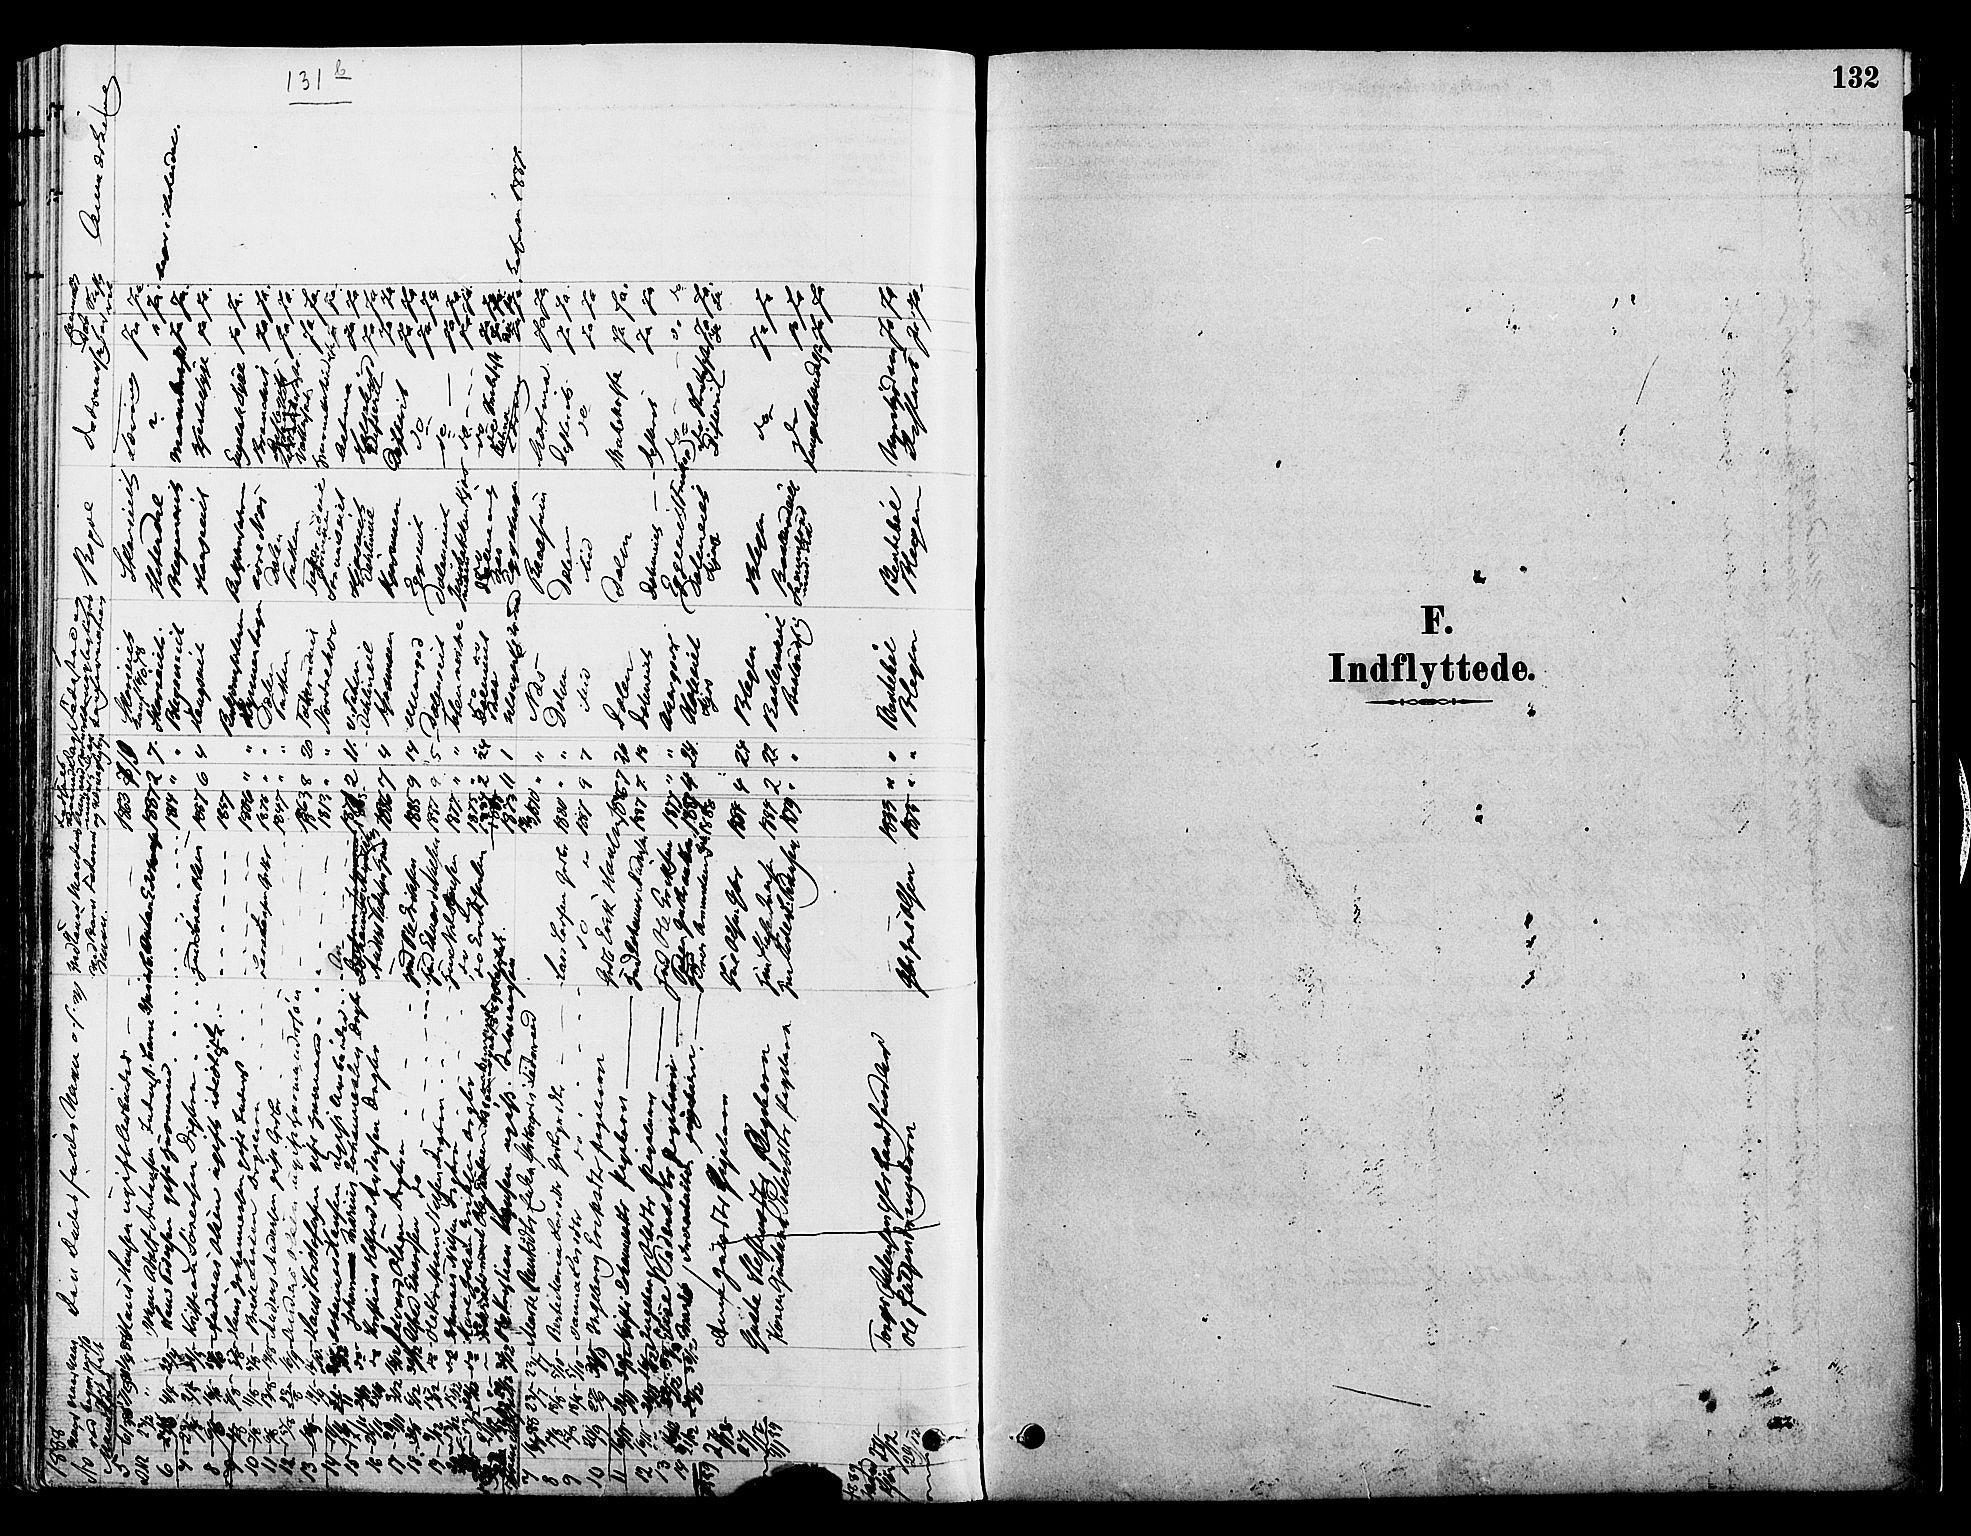 SAH, Gran prestekontor, Ministerialbok nr. 15, 1880-1888, s. 132